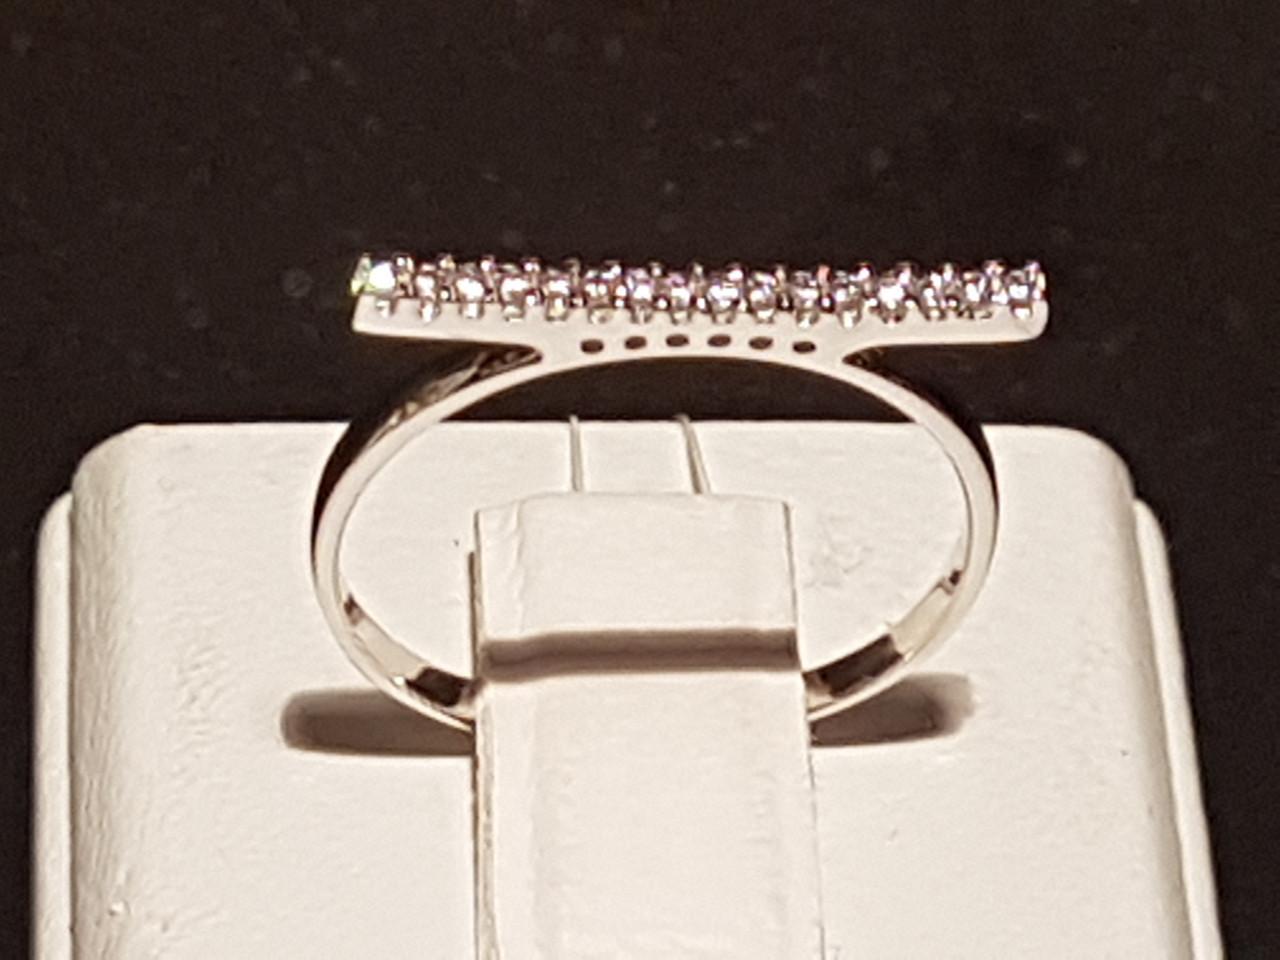 Серебряное кольцо с фианитами. Артикул 901-00946 16